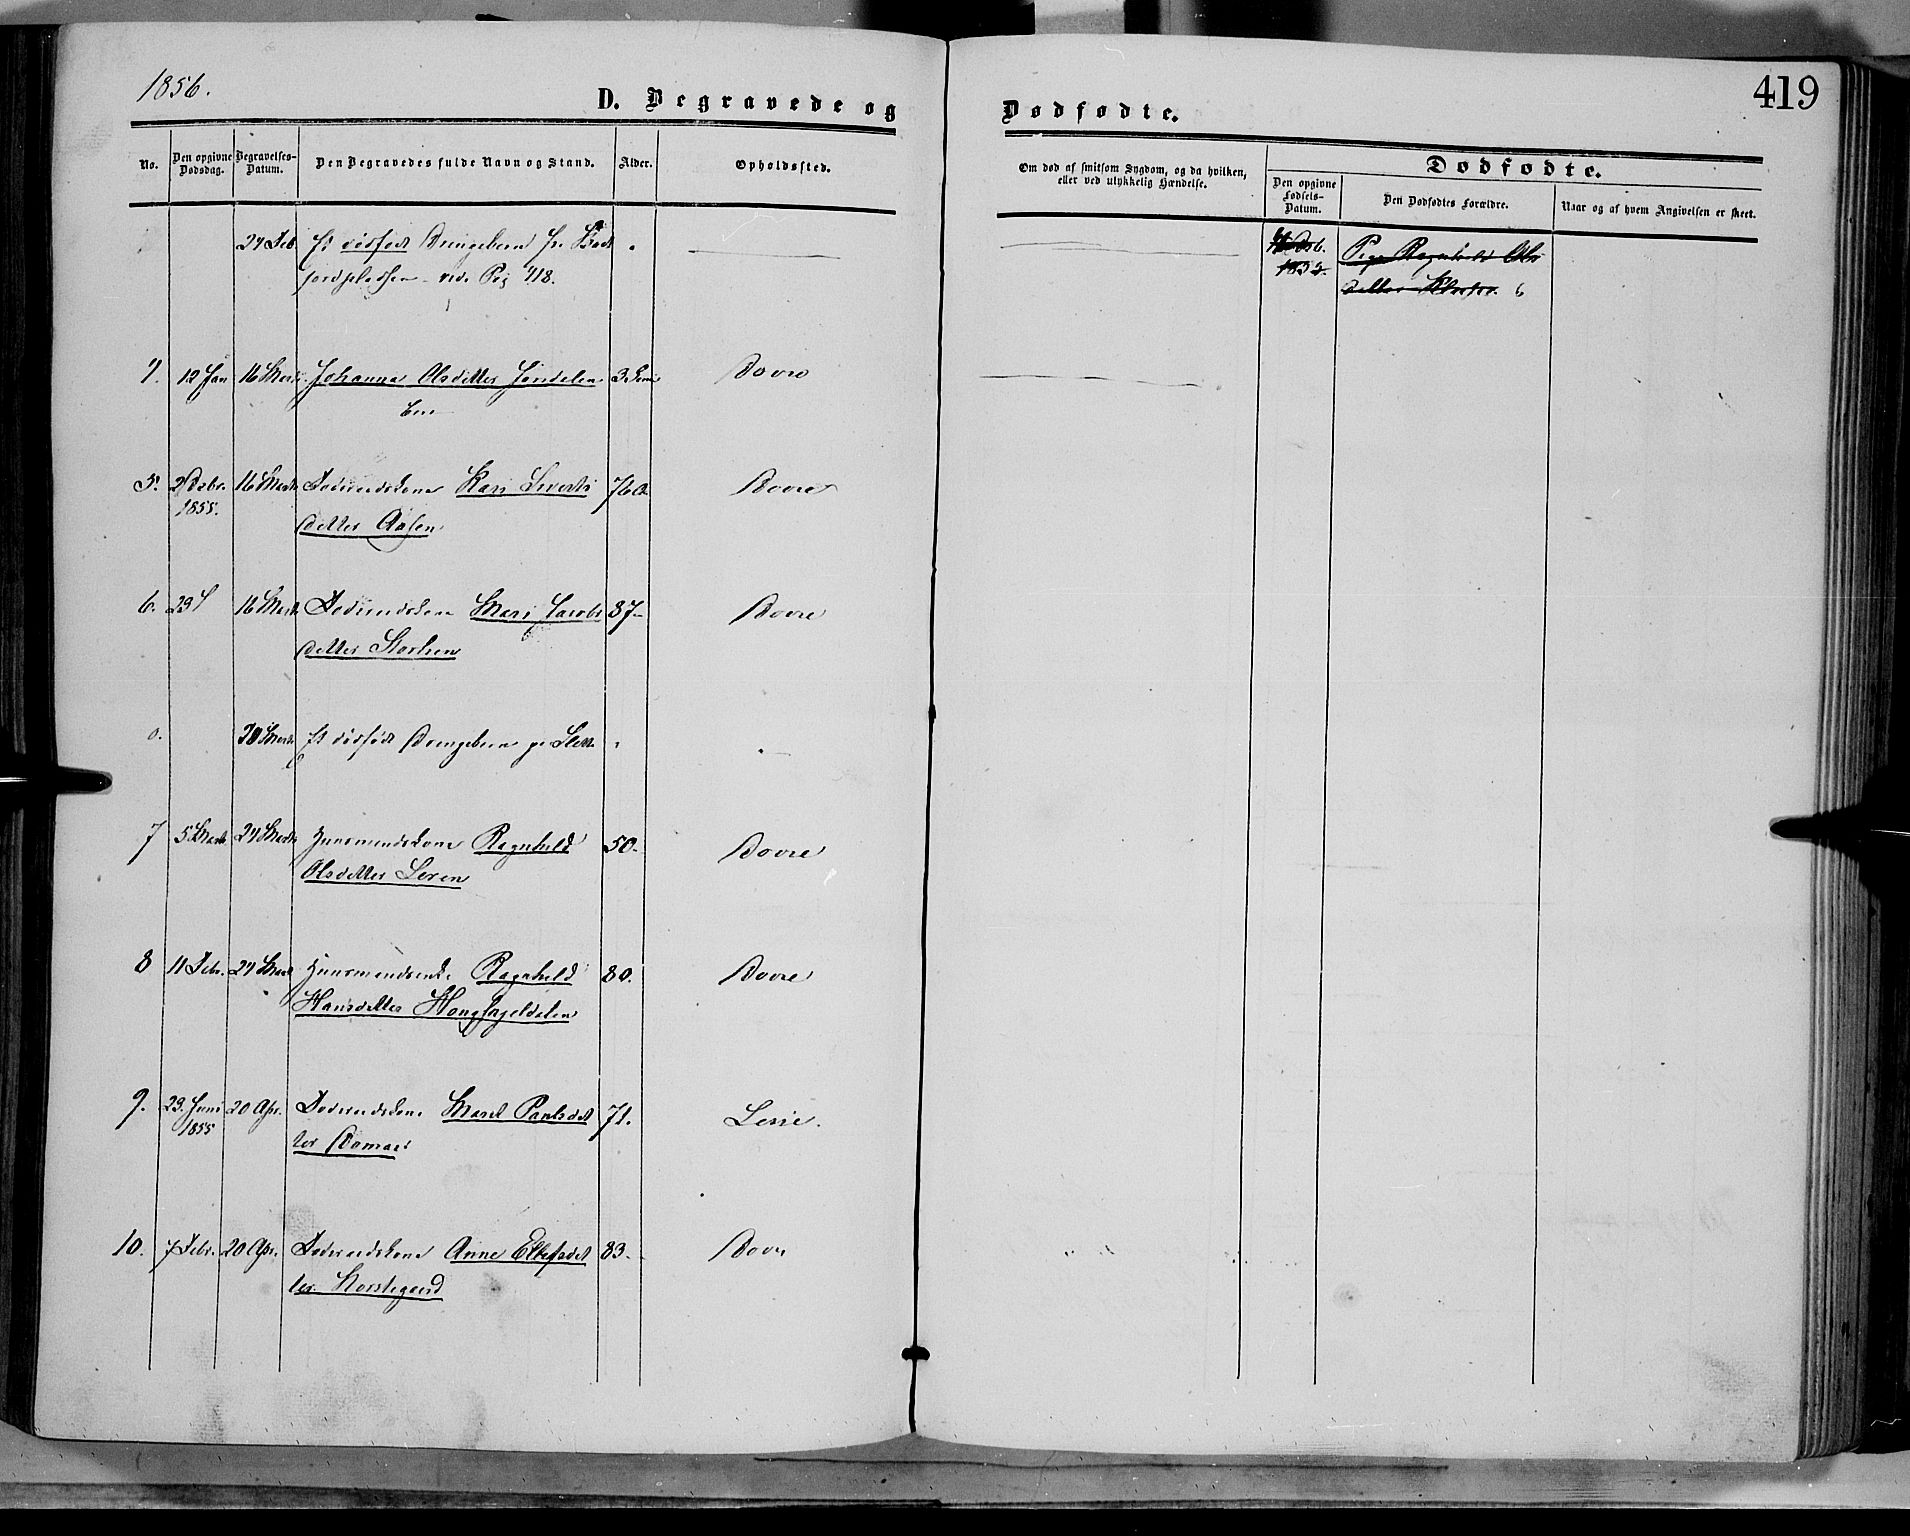 SAH, Dovre prestekontor, Parish register (official) no. 1, 1854-1878, p. 419